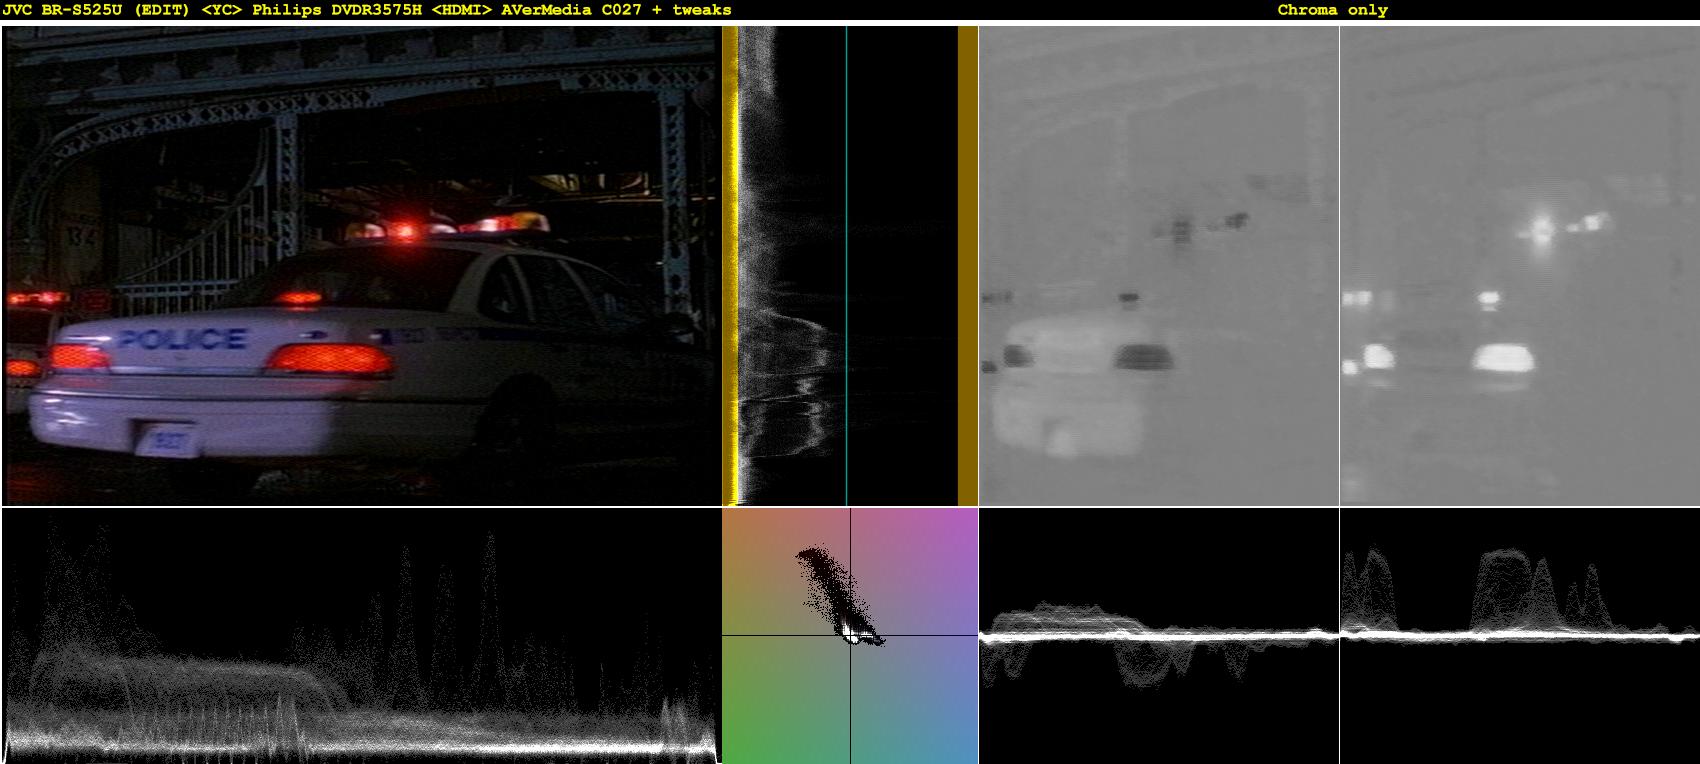 Click image for larger version  Name:0-55-31 - JVC BR-S525U (EDIT).png Views:1302 Size:862.7 KB ID:37676